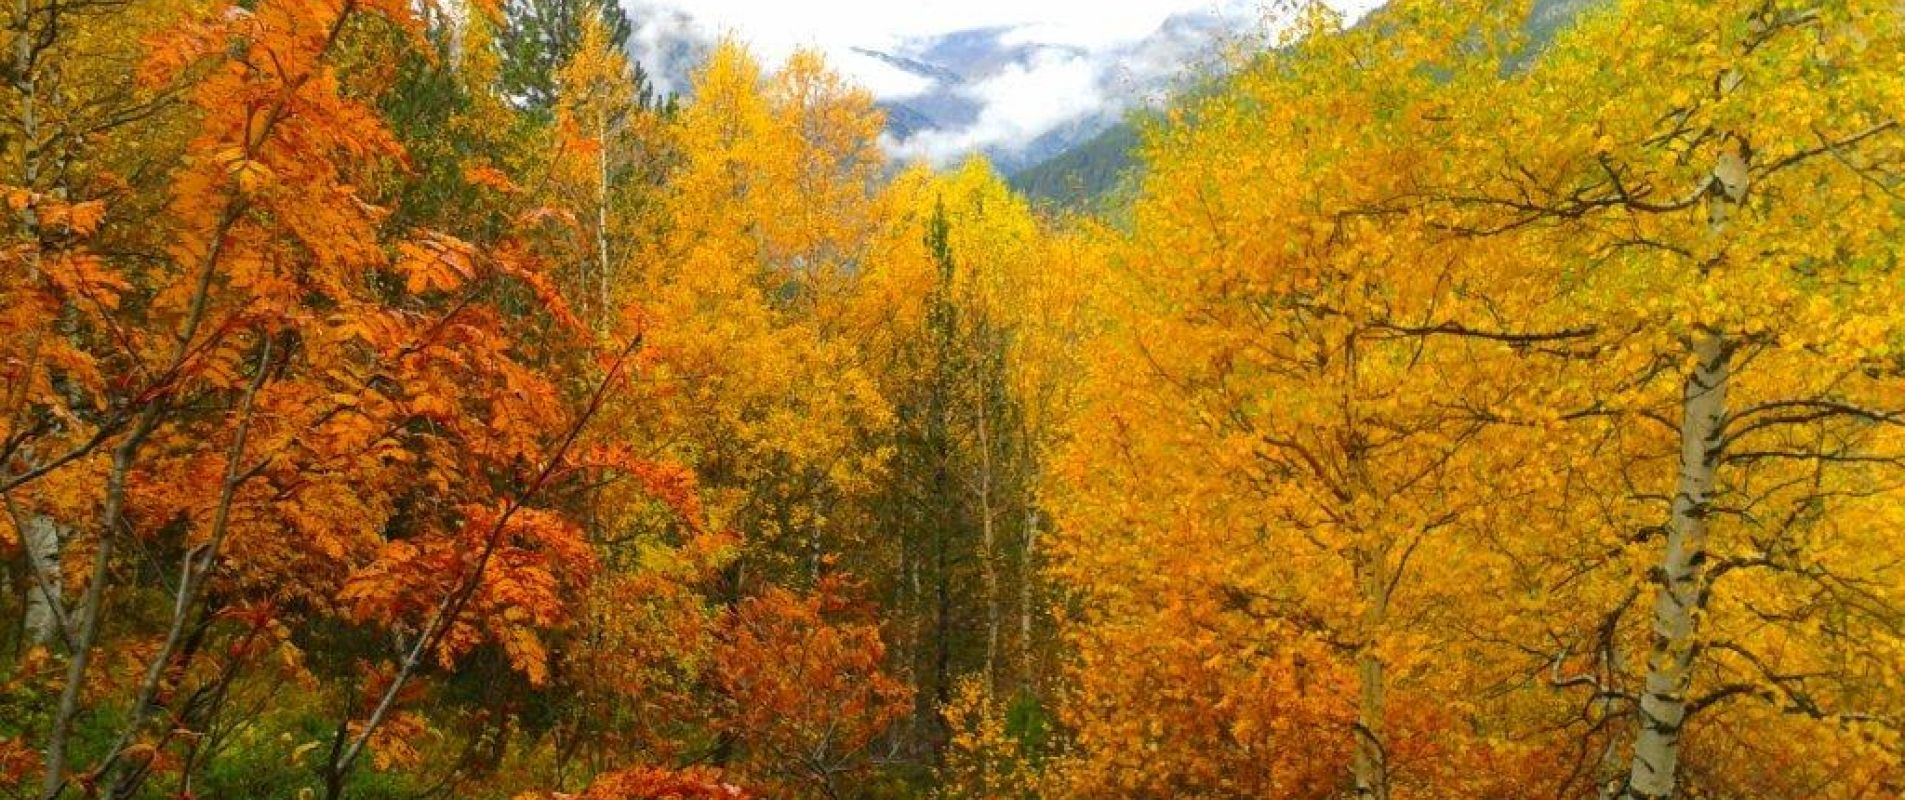 La tardor a Andorra